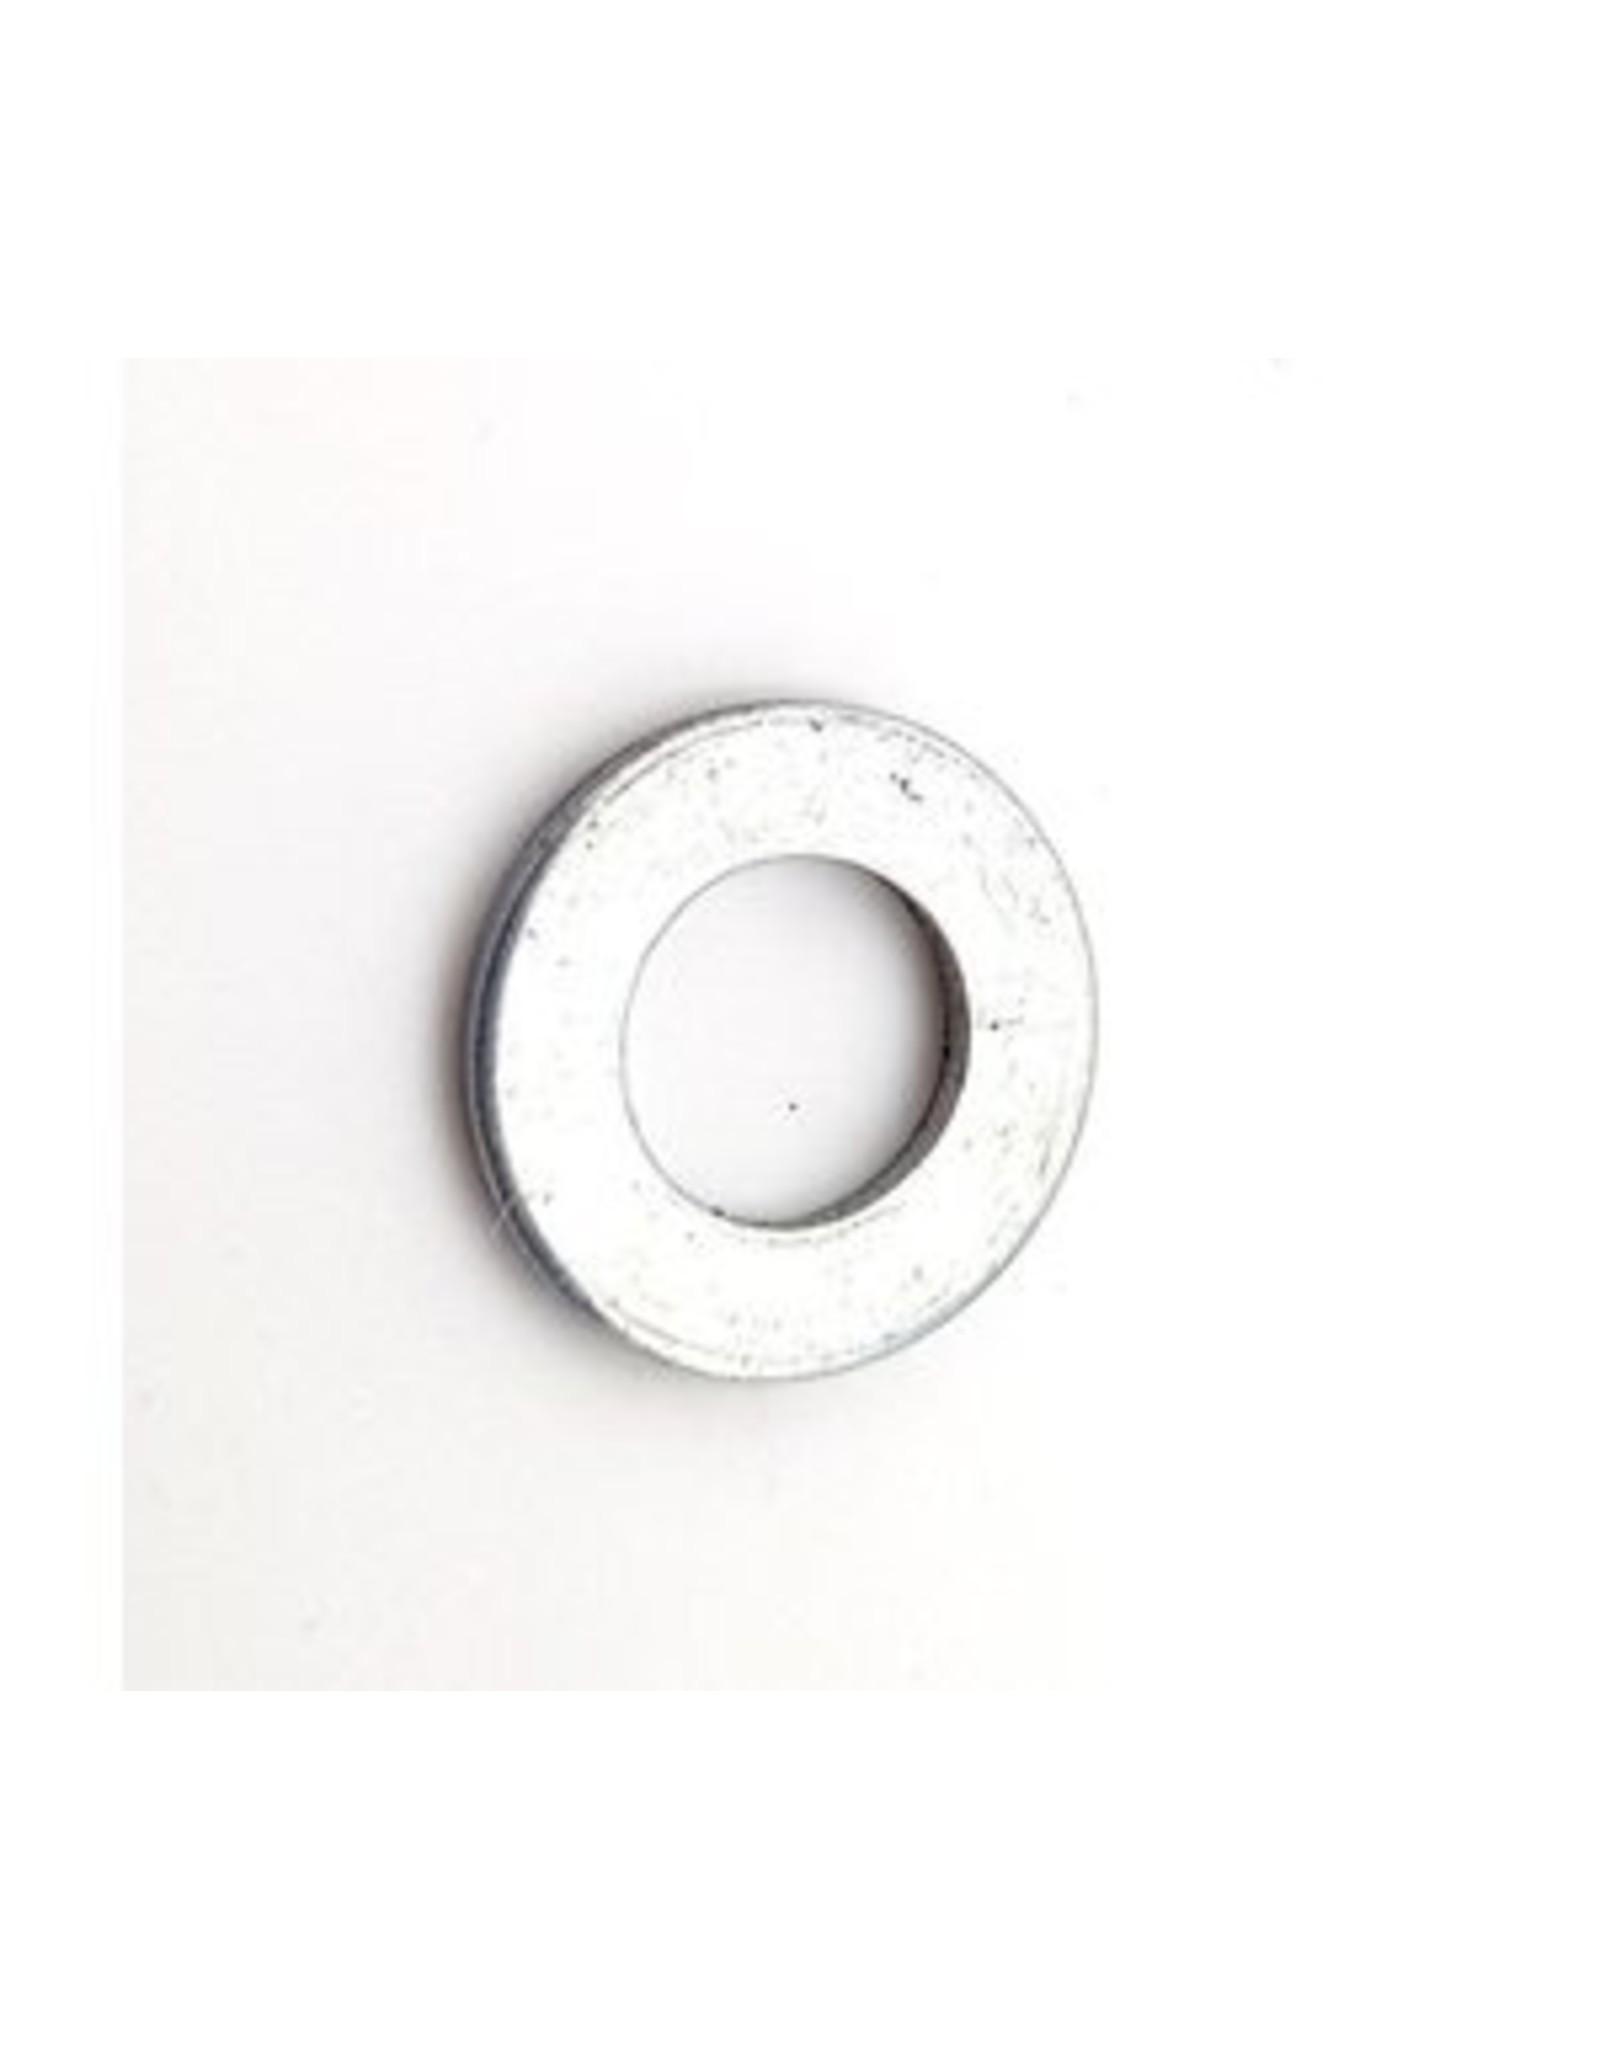 Iame Iame 60CC Swift uitlaat spruitstuk ring m6